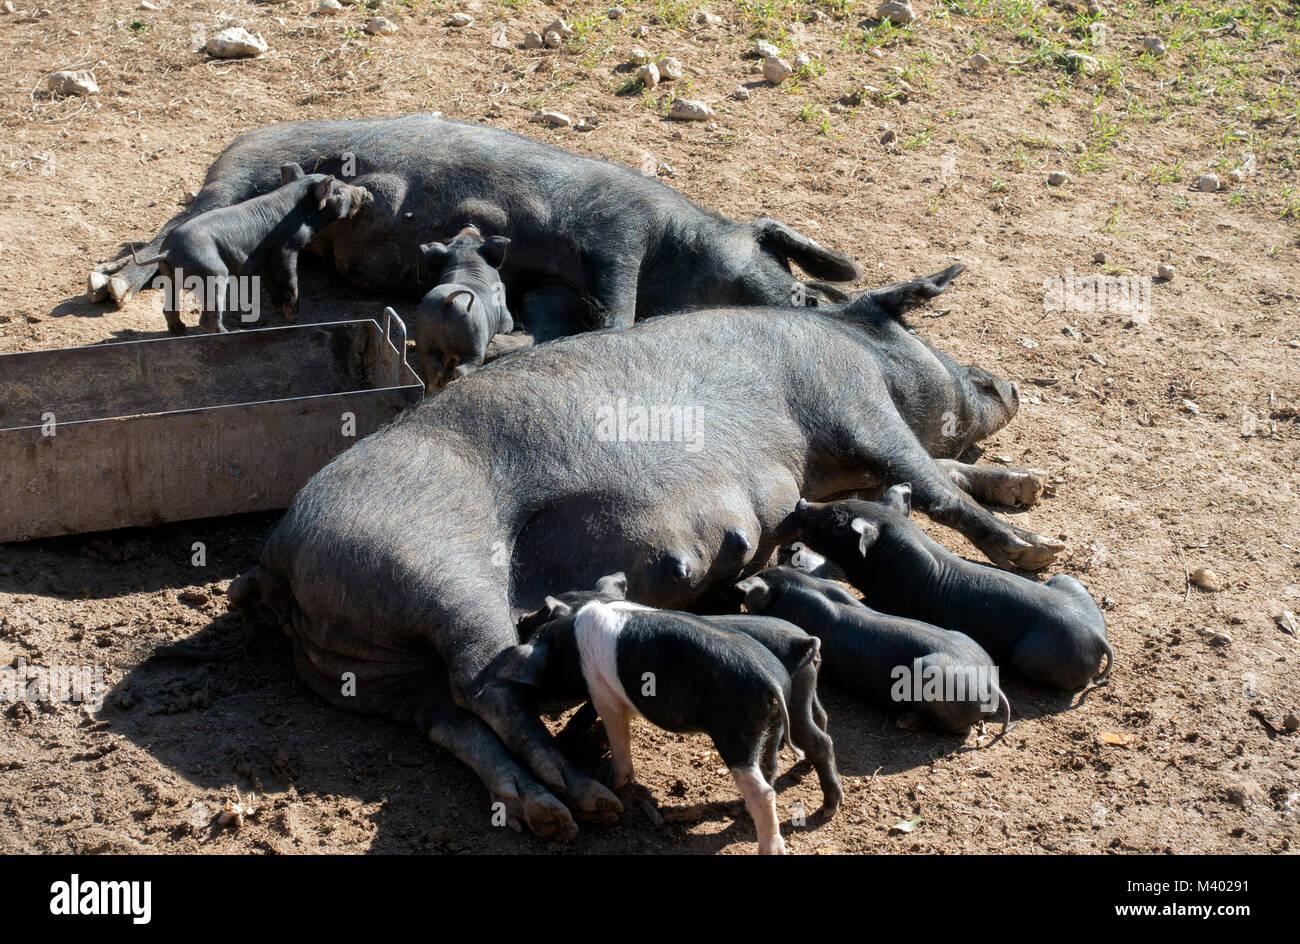 Black pigs farm.Mallorca Island.spain - Stock Image